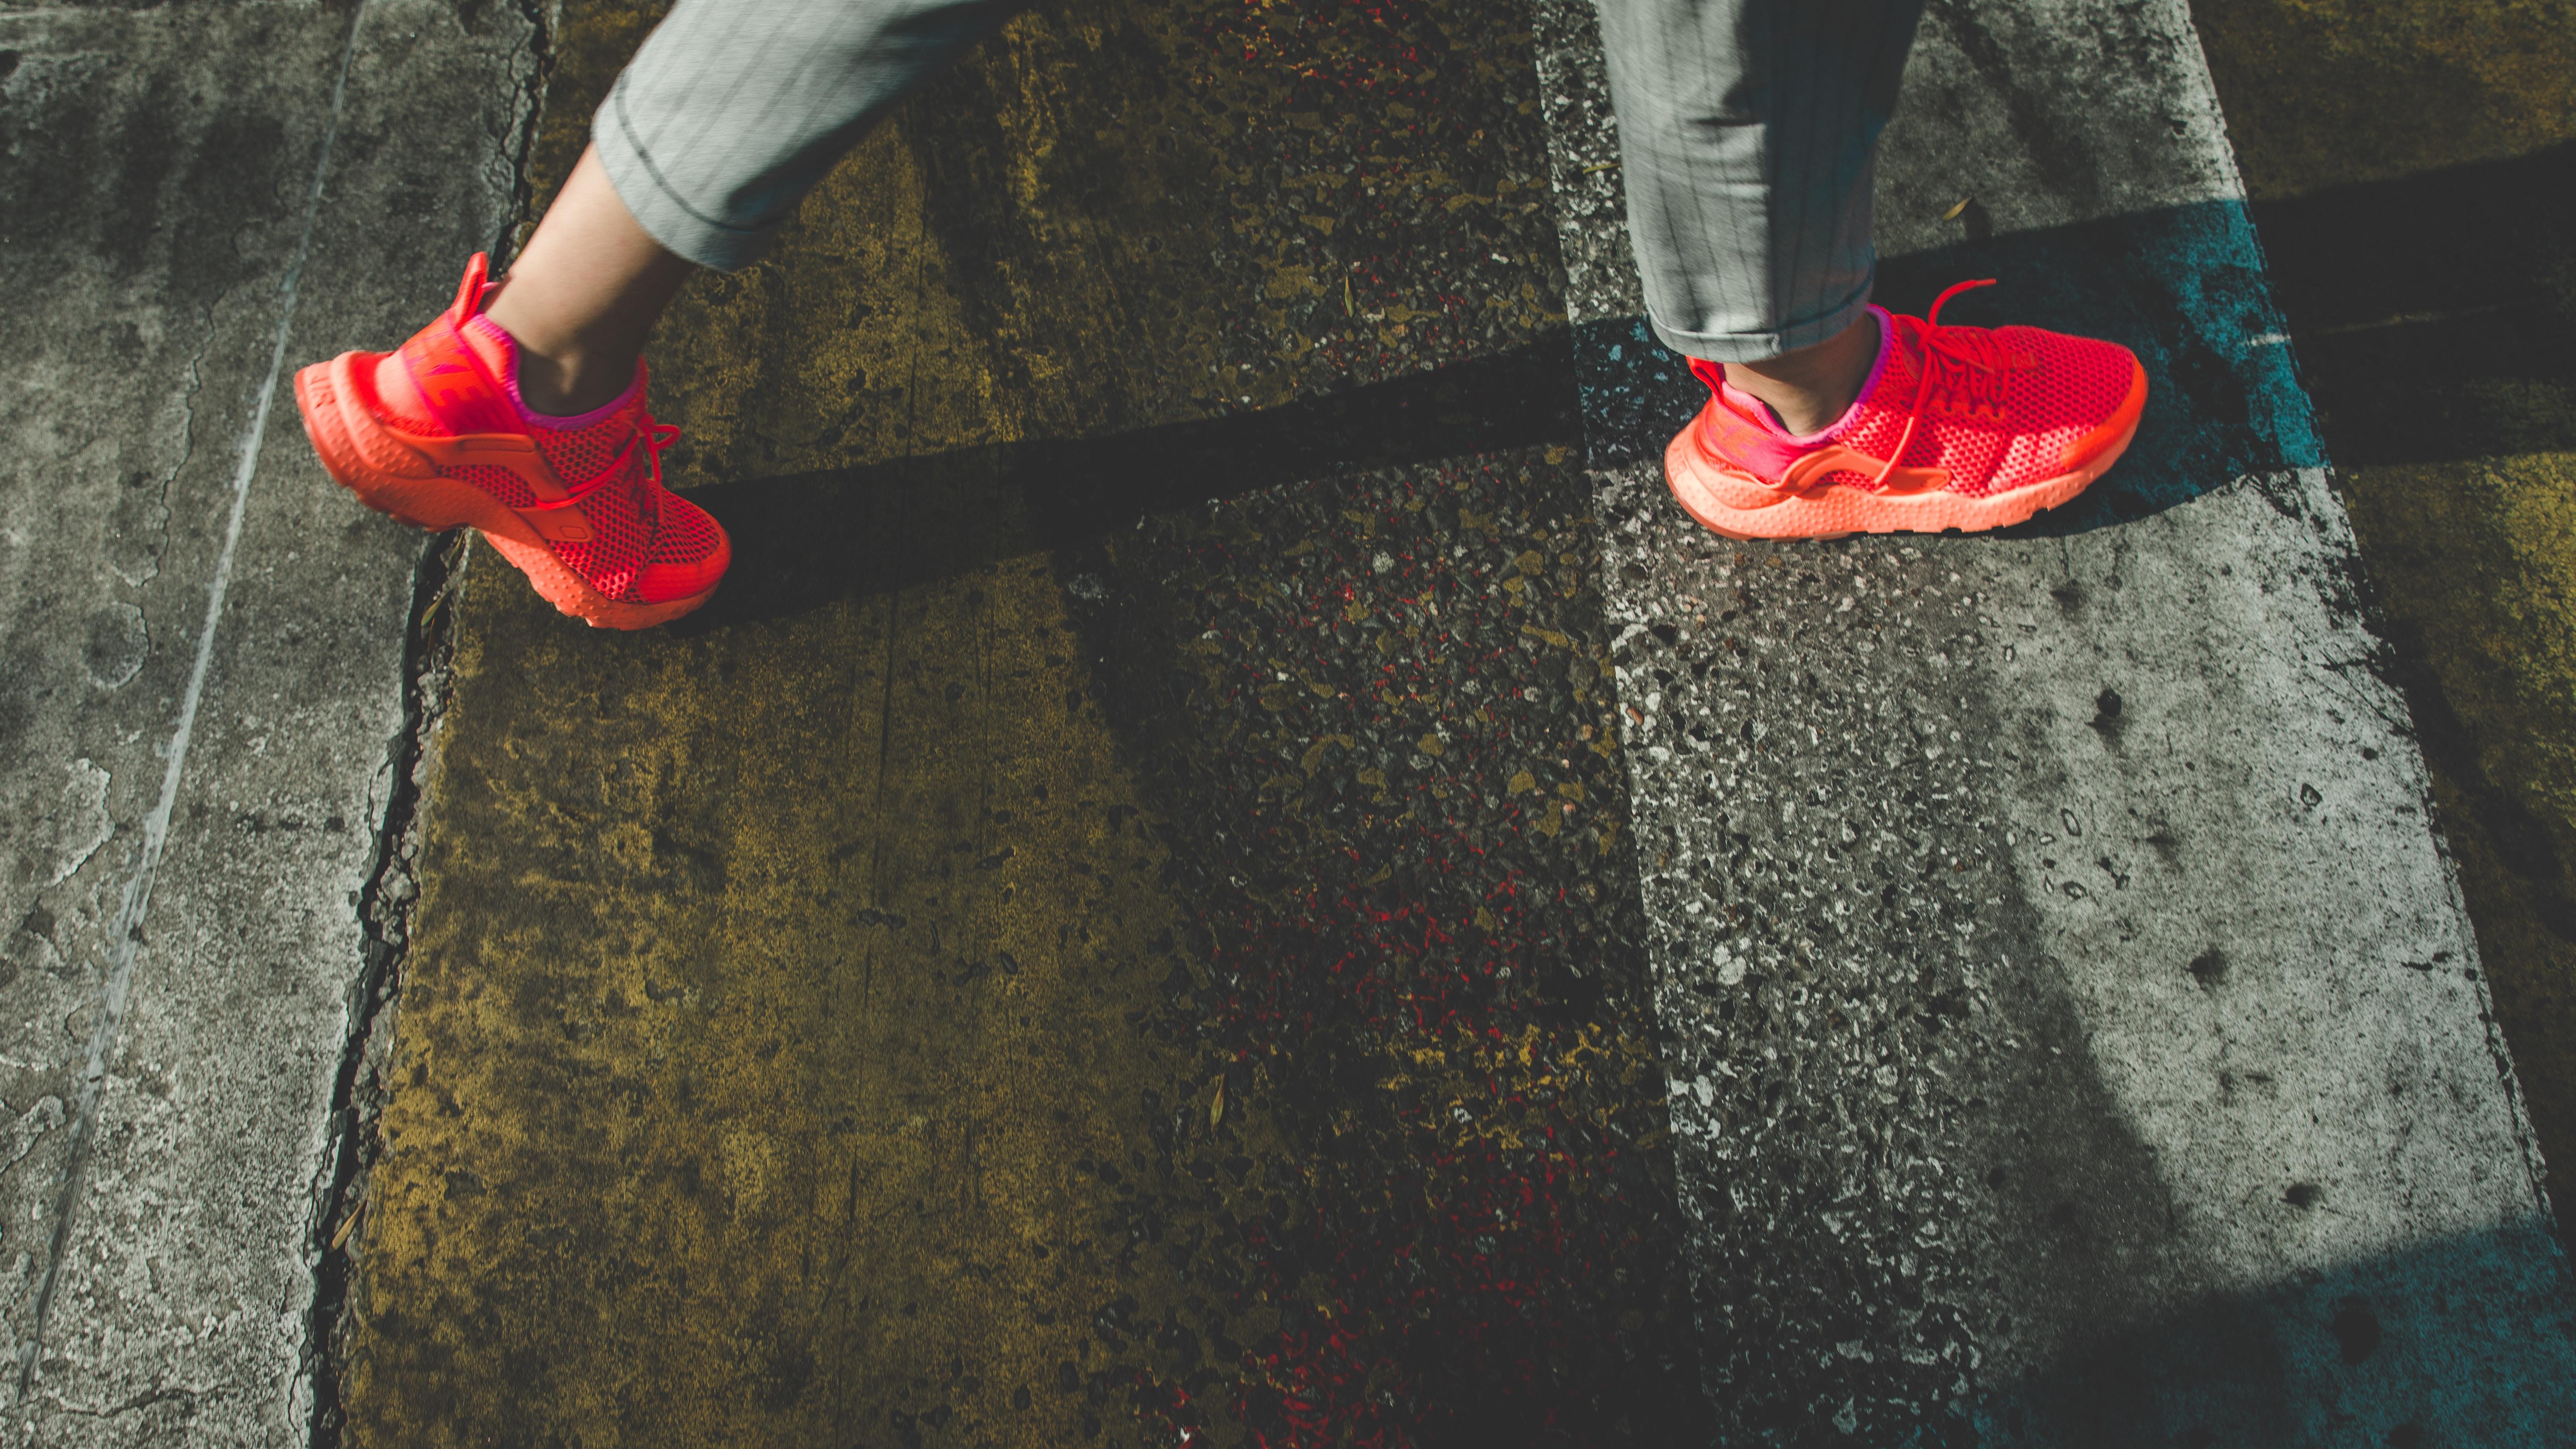 closeup photo of person wearing red Nike Air Huarache shoes